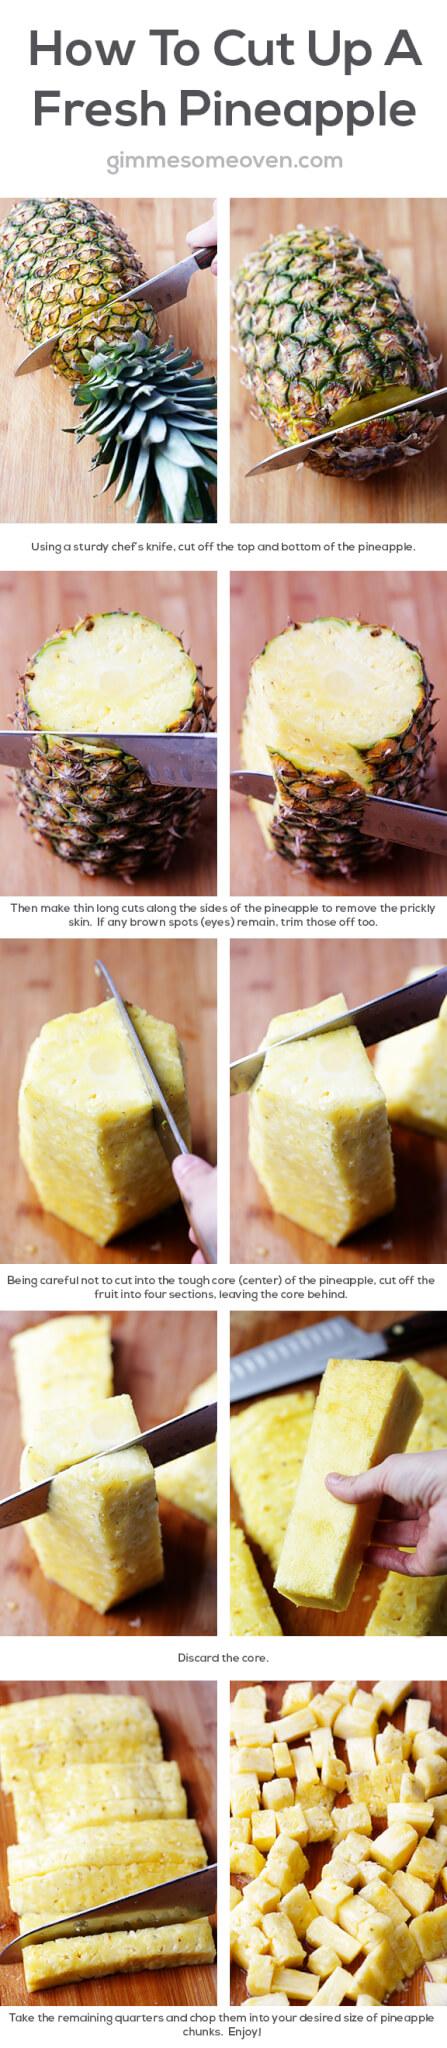 How To Cut A Pineapple Gimmesomeovencom